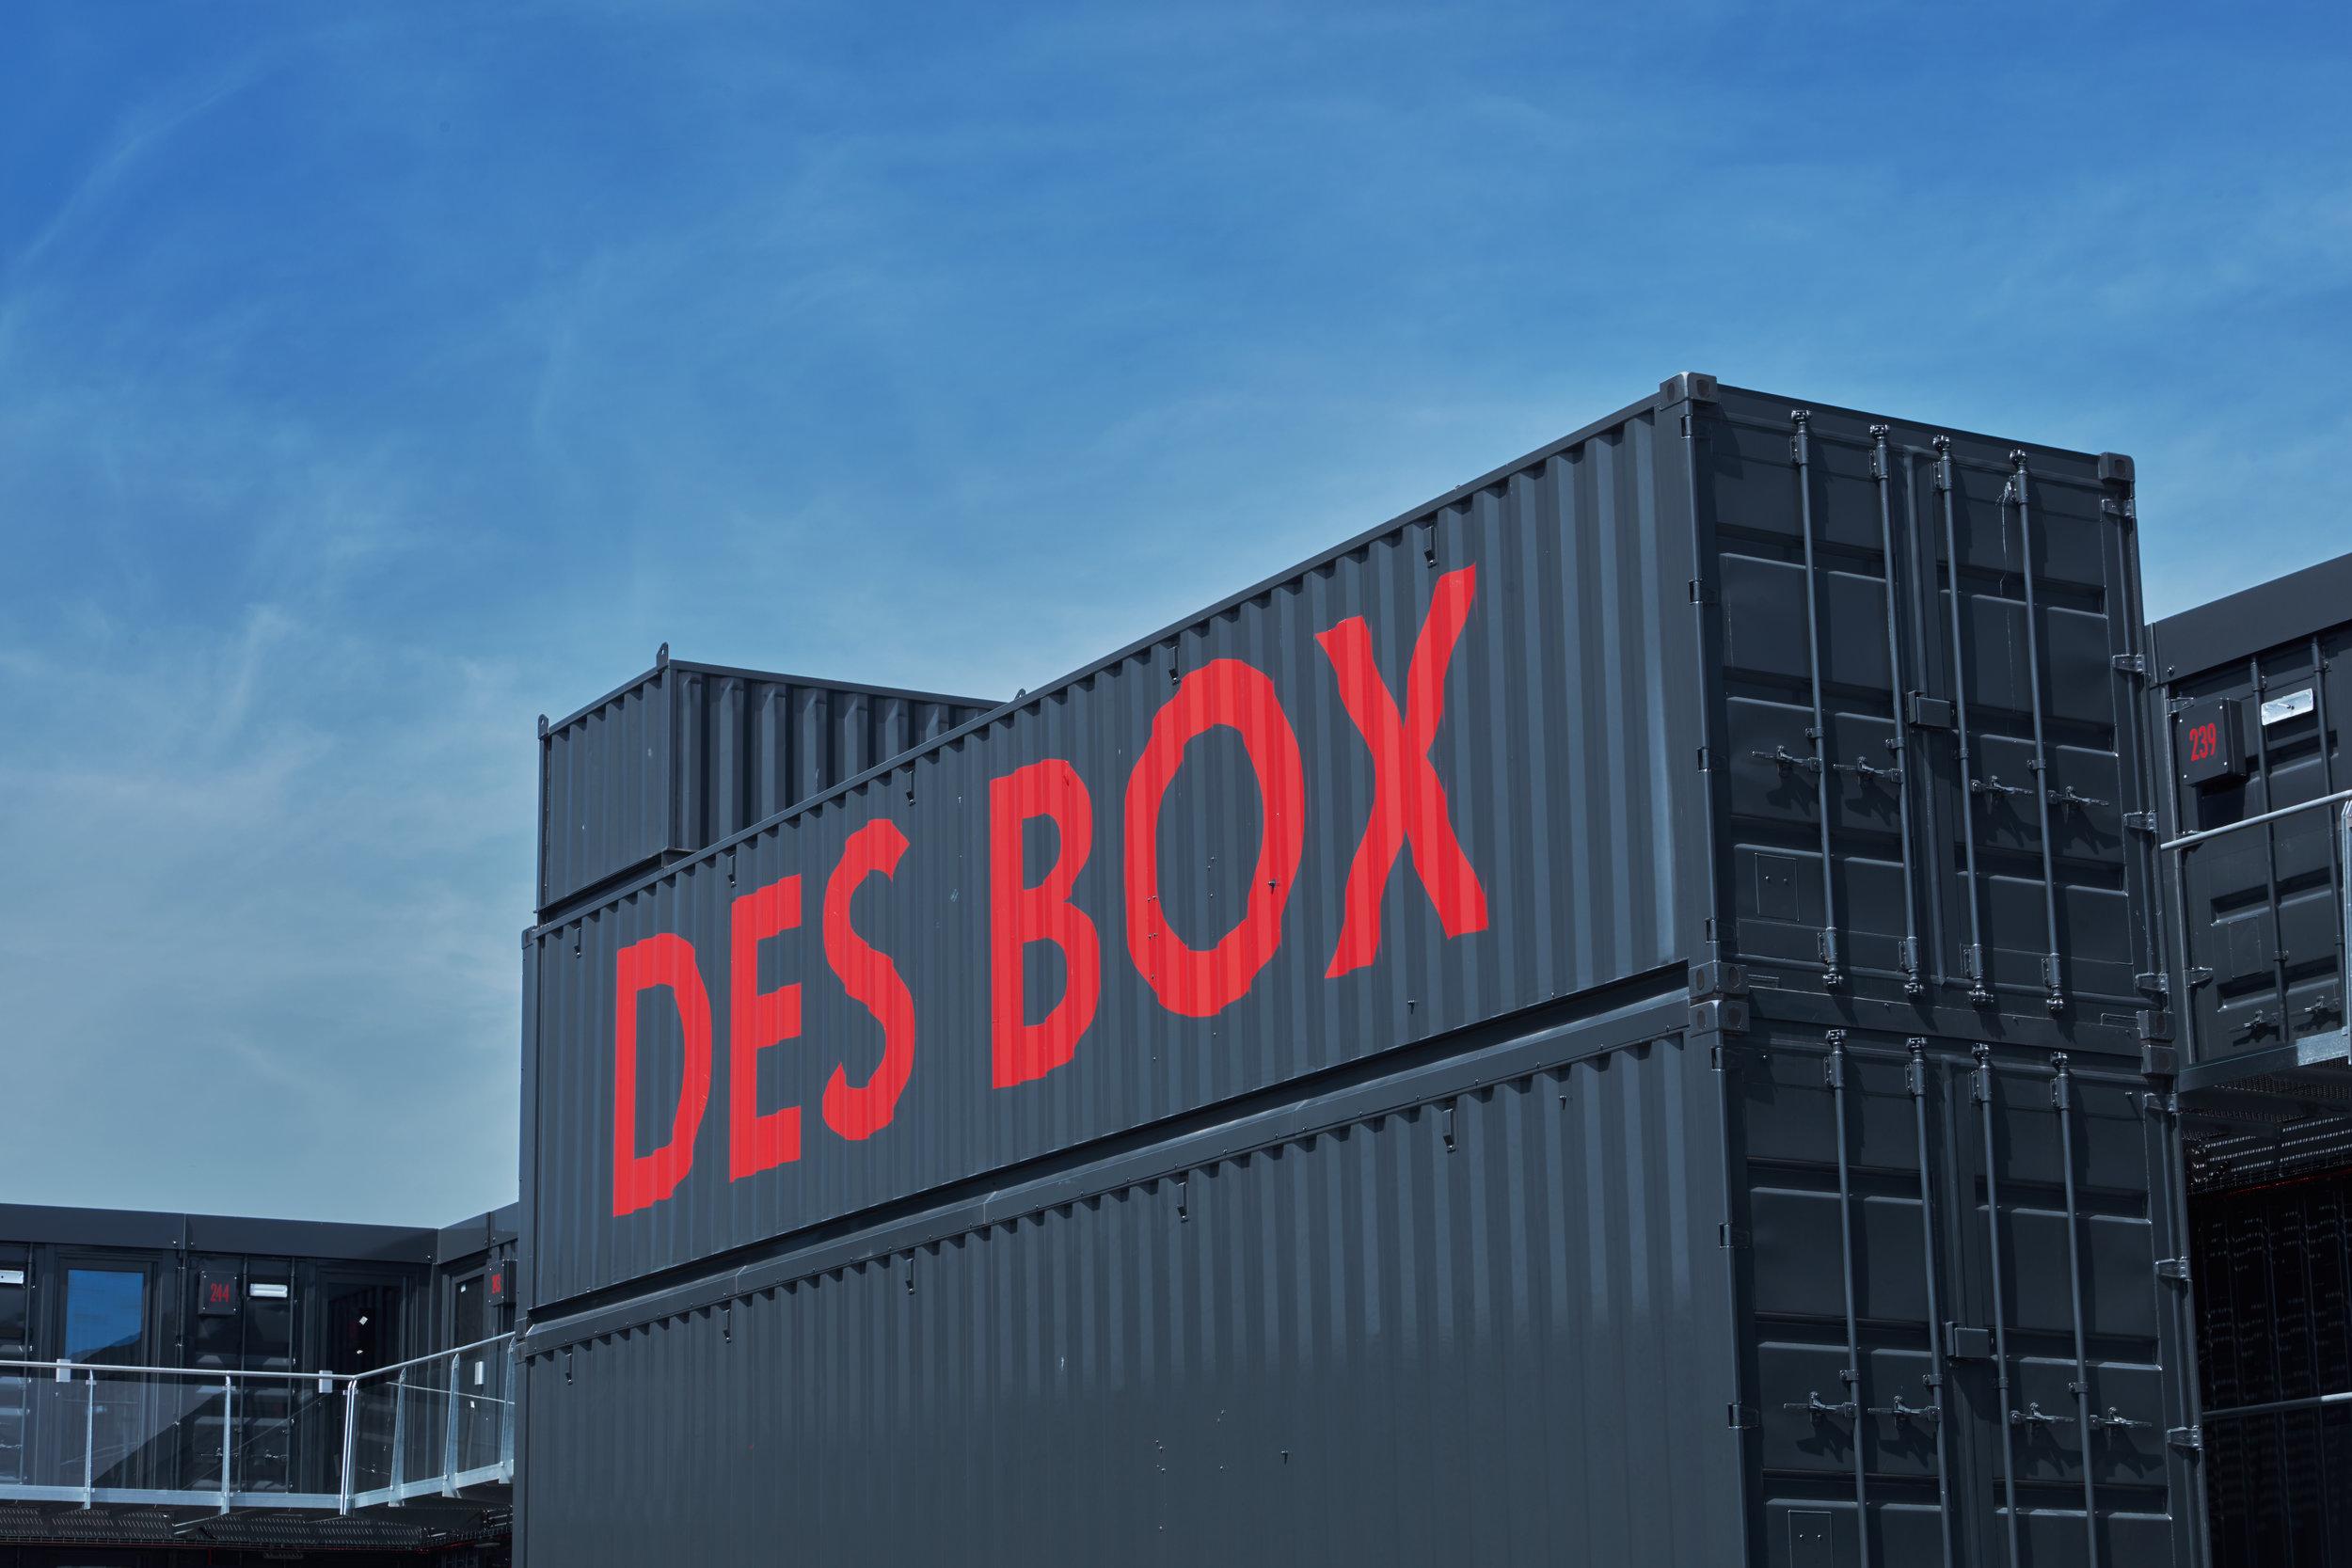 Urban Space - Desbox - 005.jpg